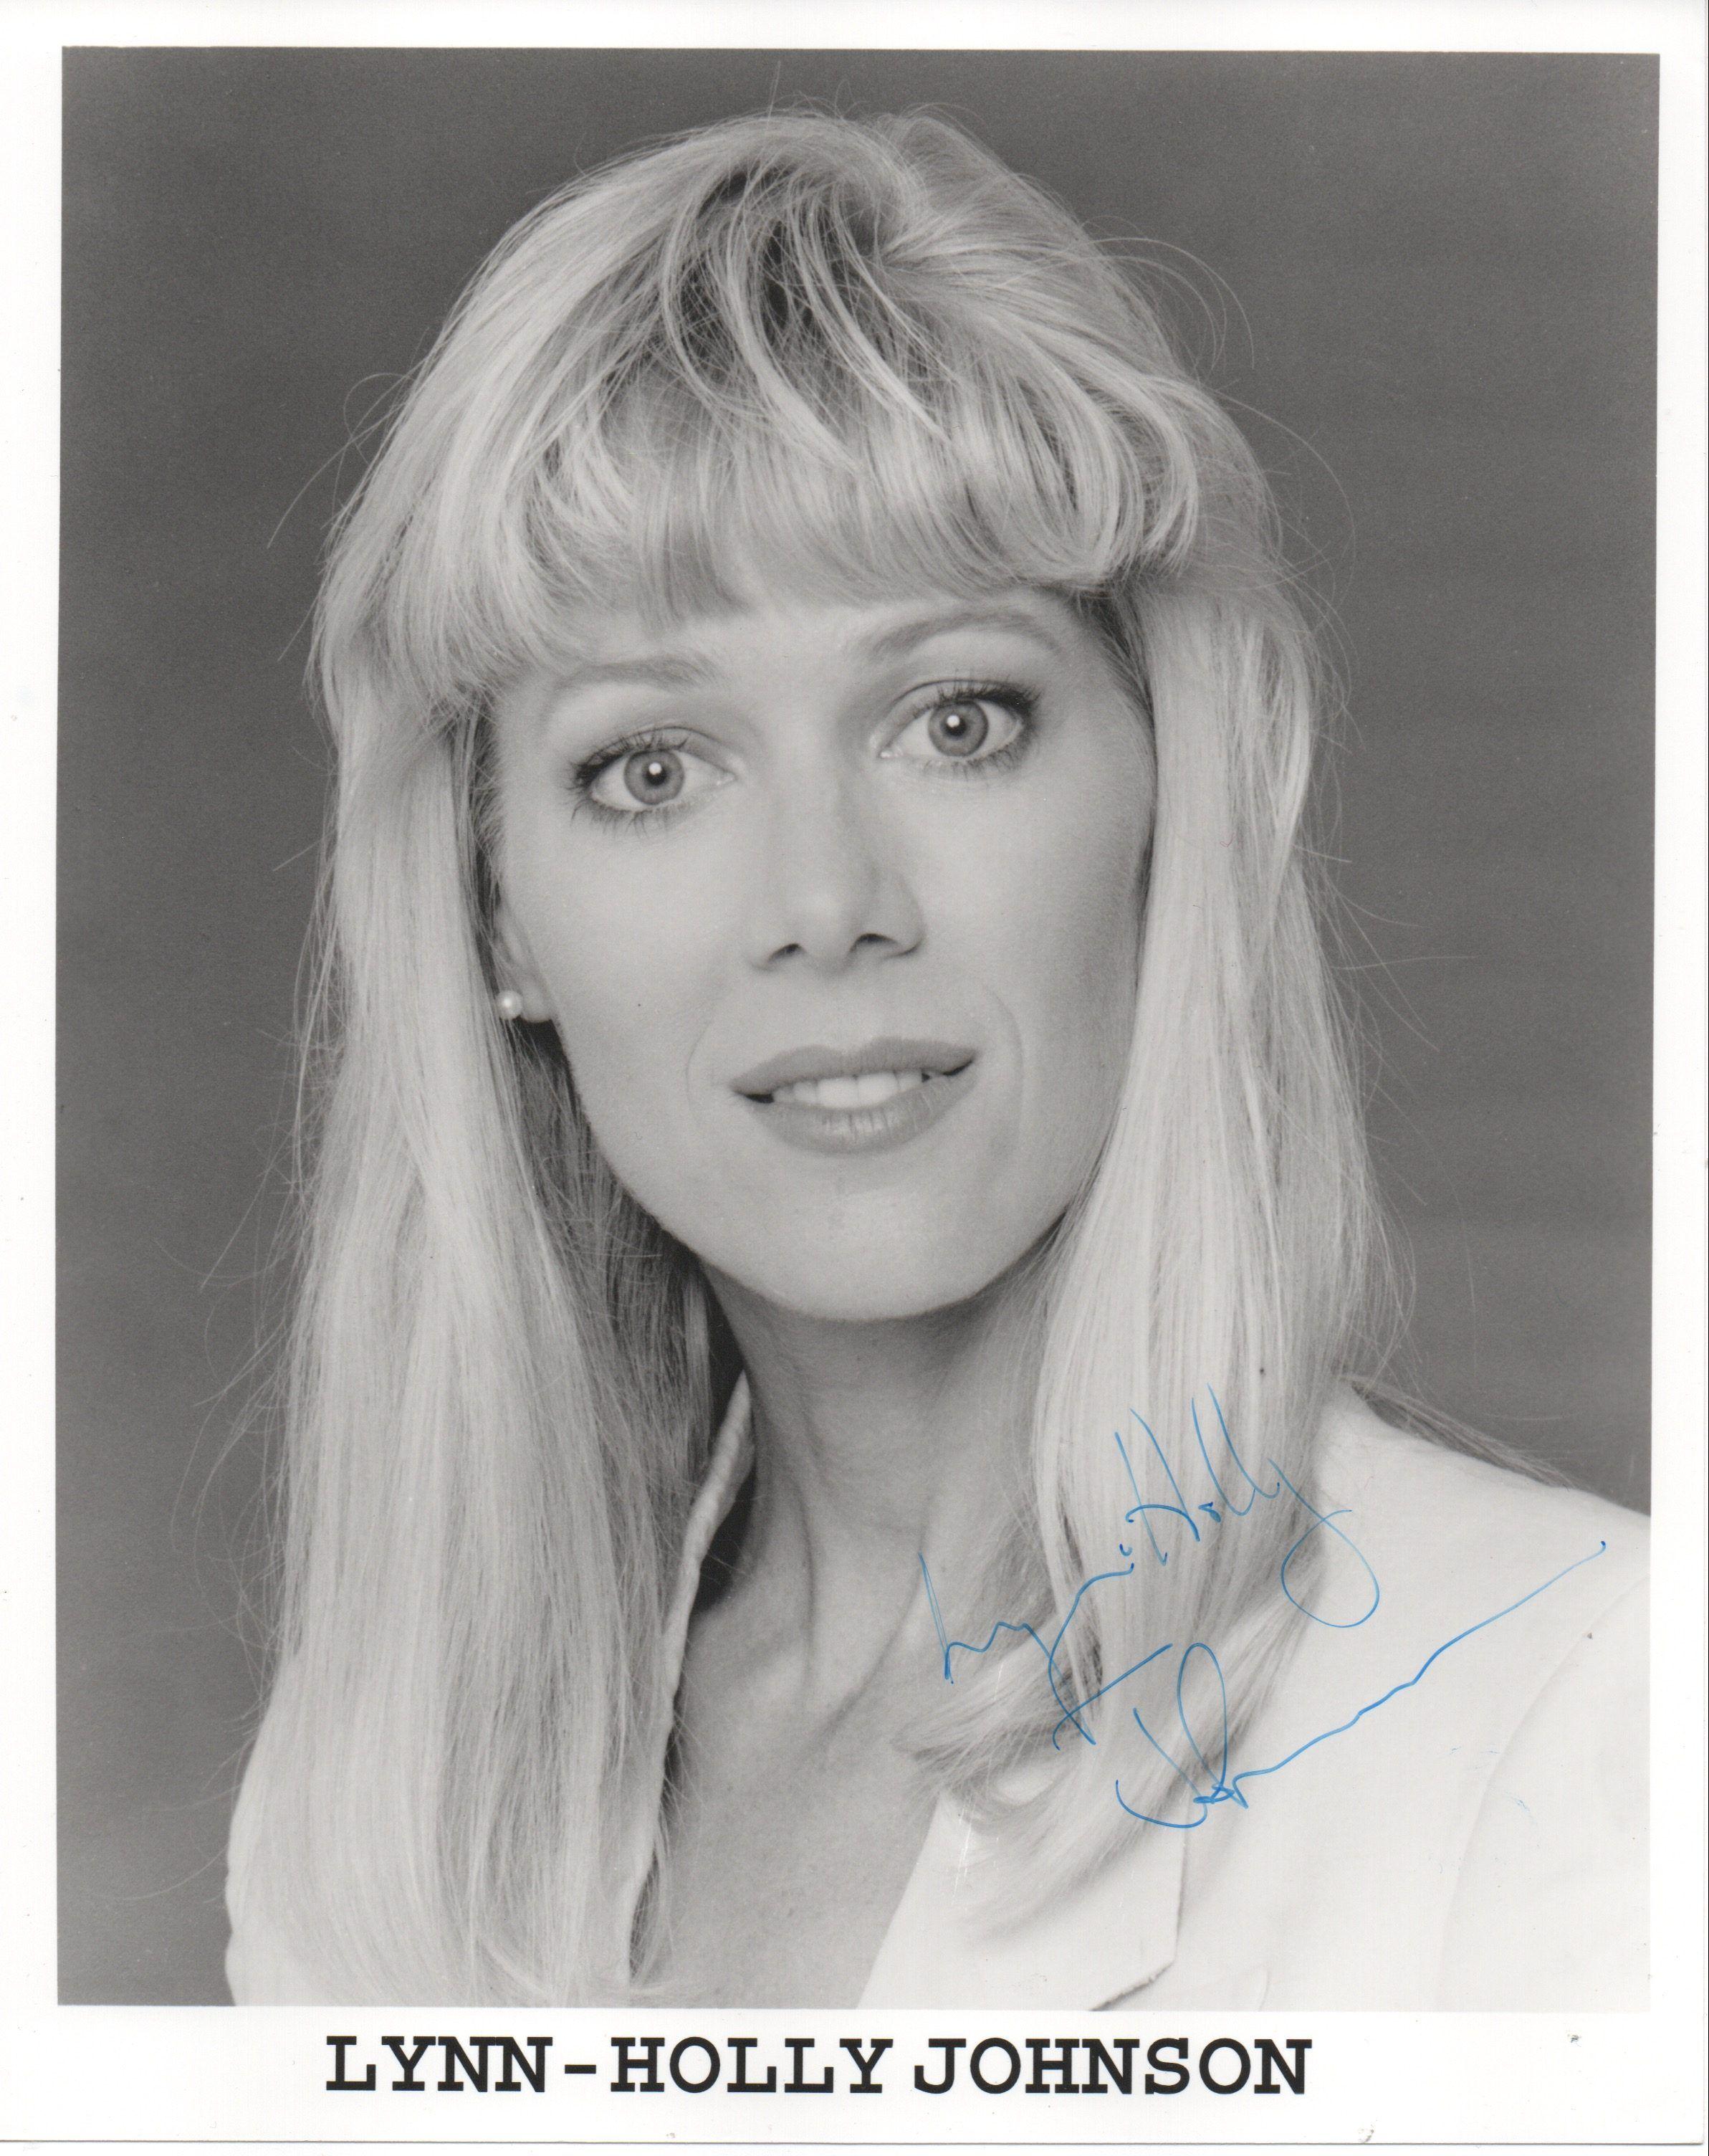 Lynn Holly Johnson | Holly johnson, Johnson, Lynn